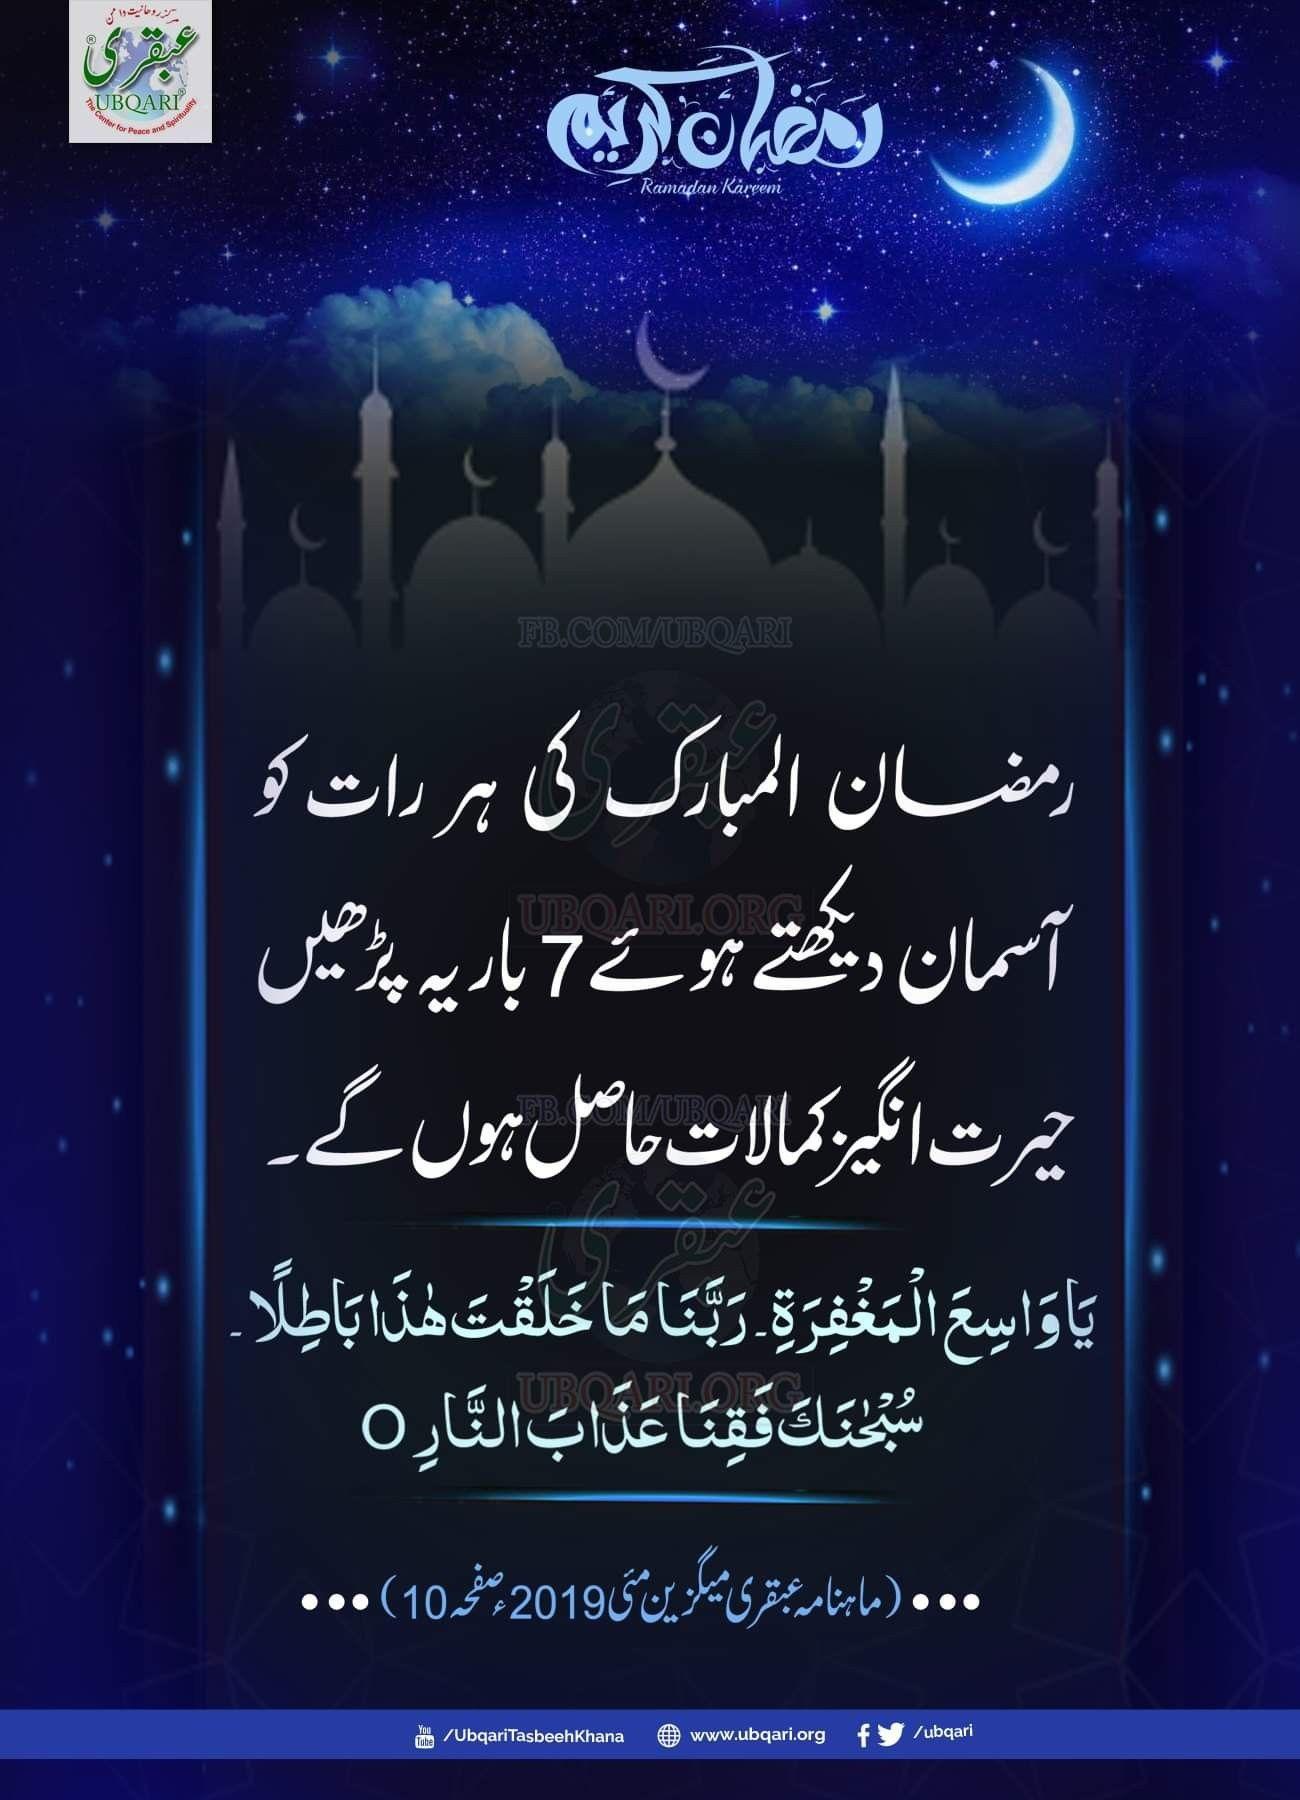 Loveislam Islamic Messages Ramadan Quotes Islam Hadith